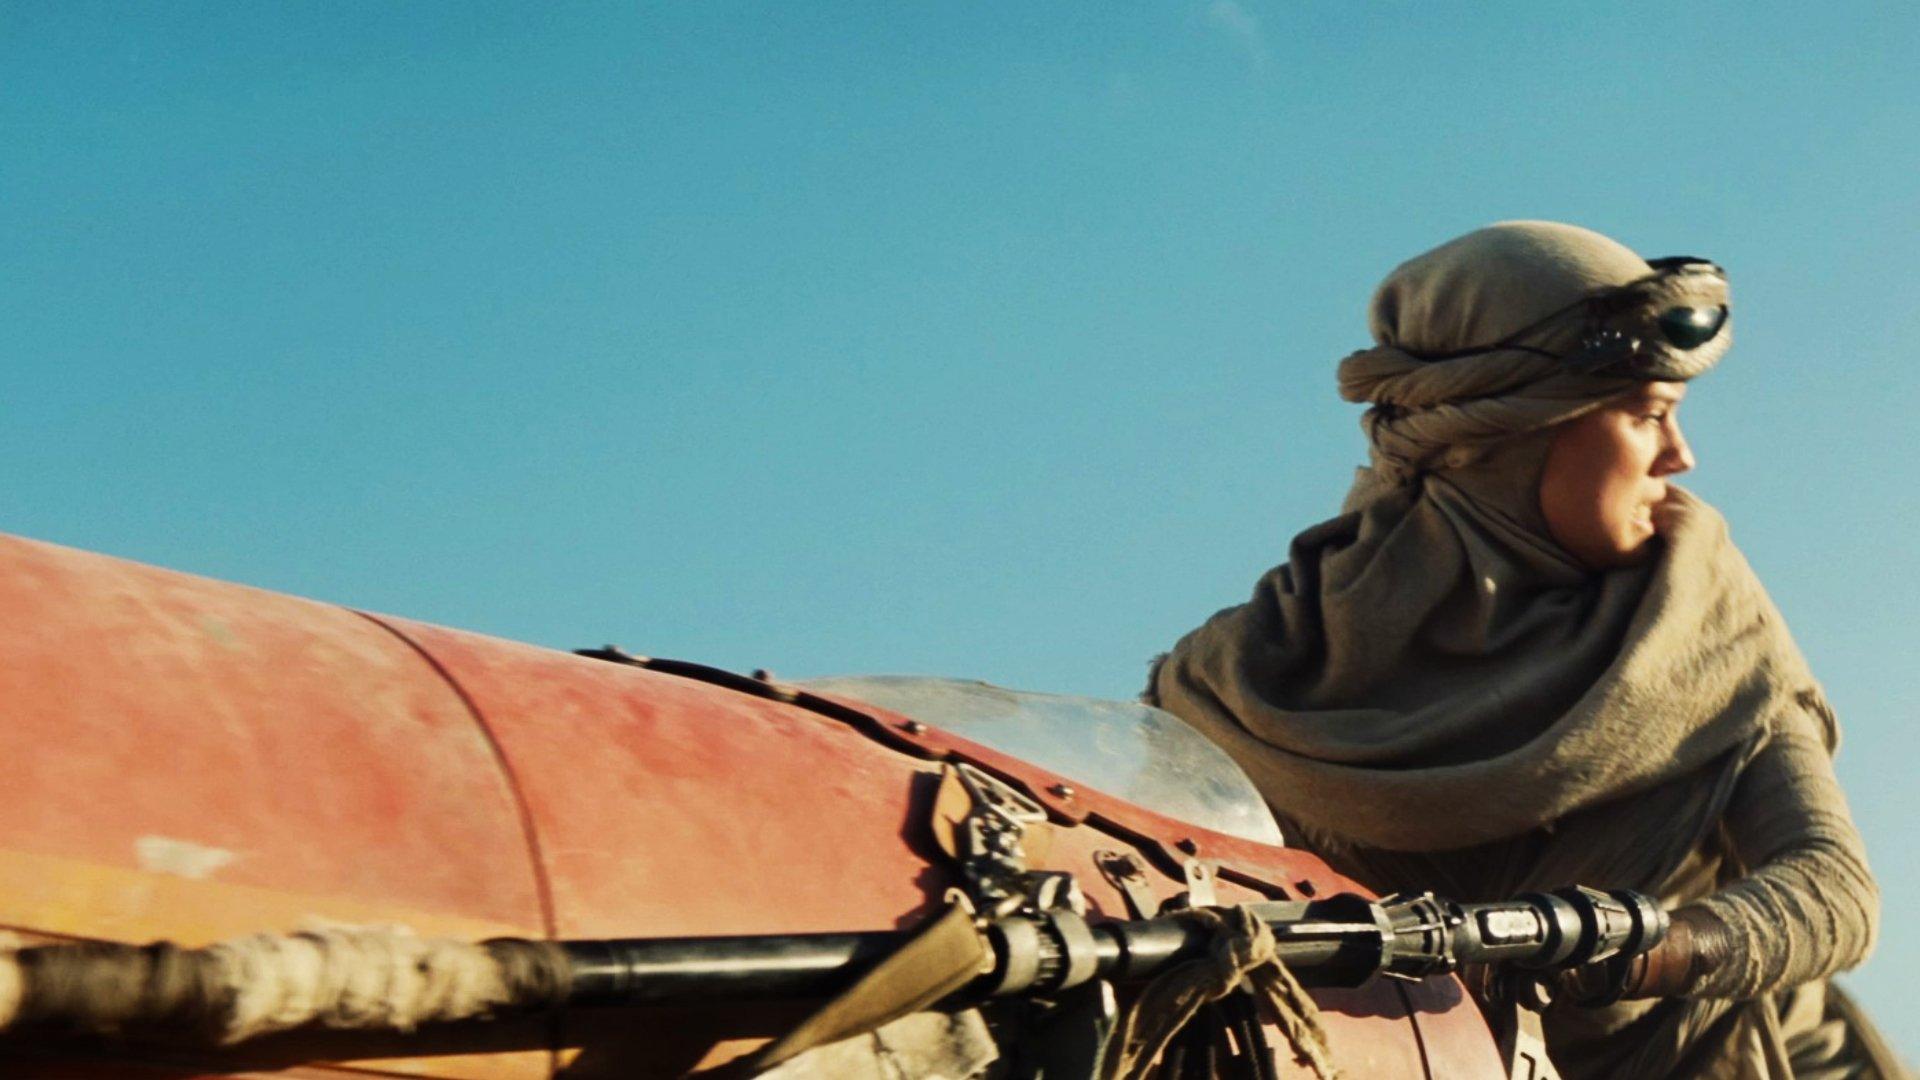 Star wars episode vii the force awakens full hd wallpaper - Star wars the force awakens desktop wallpaper ...